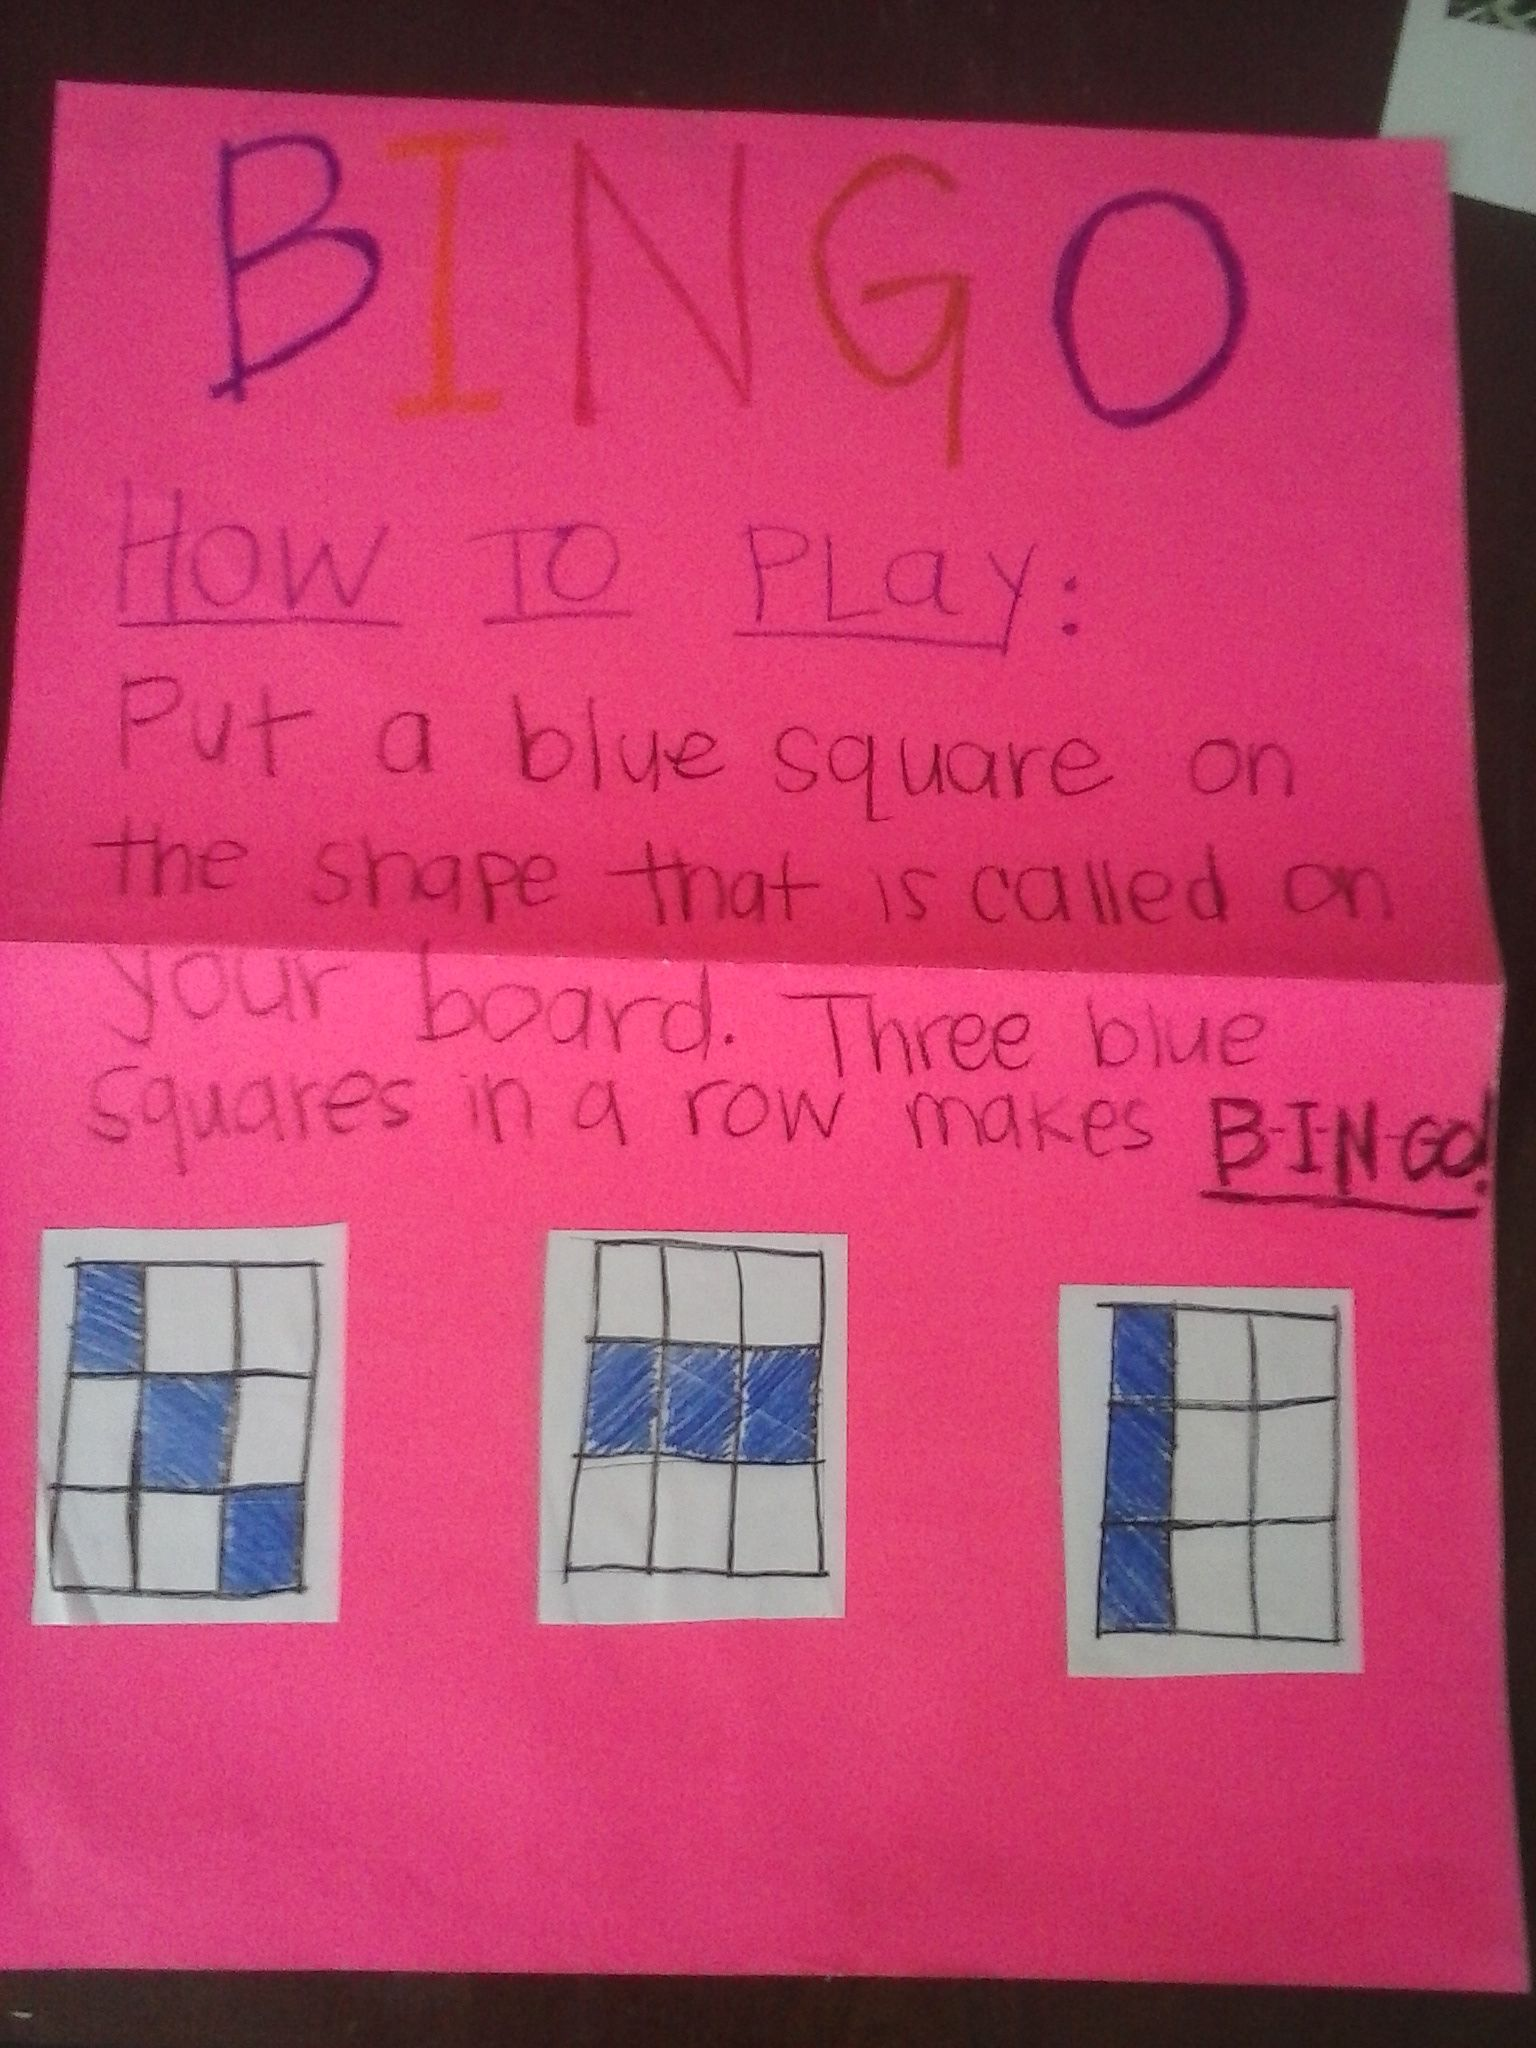 Bingo Game Rules Bingo, Blue square, Bingo games